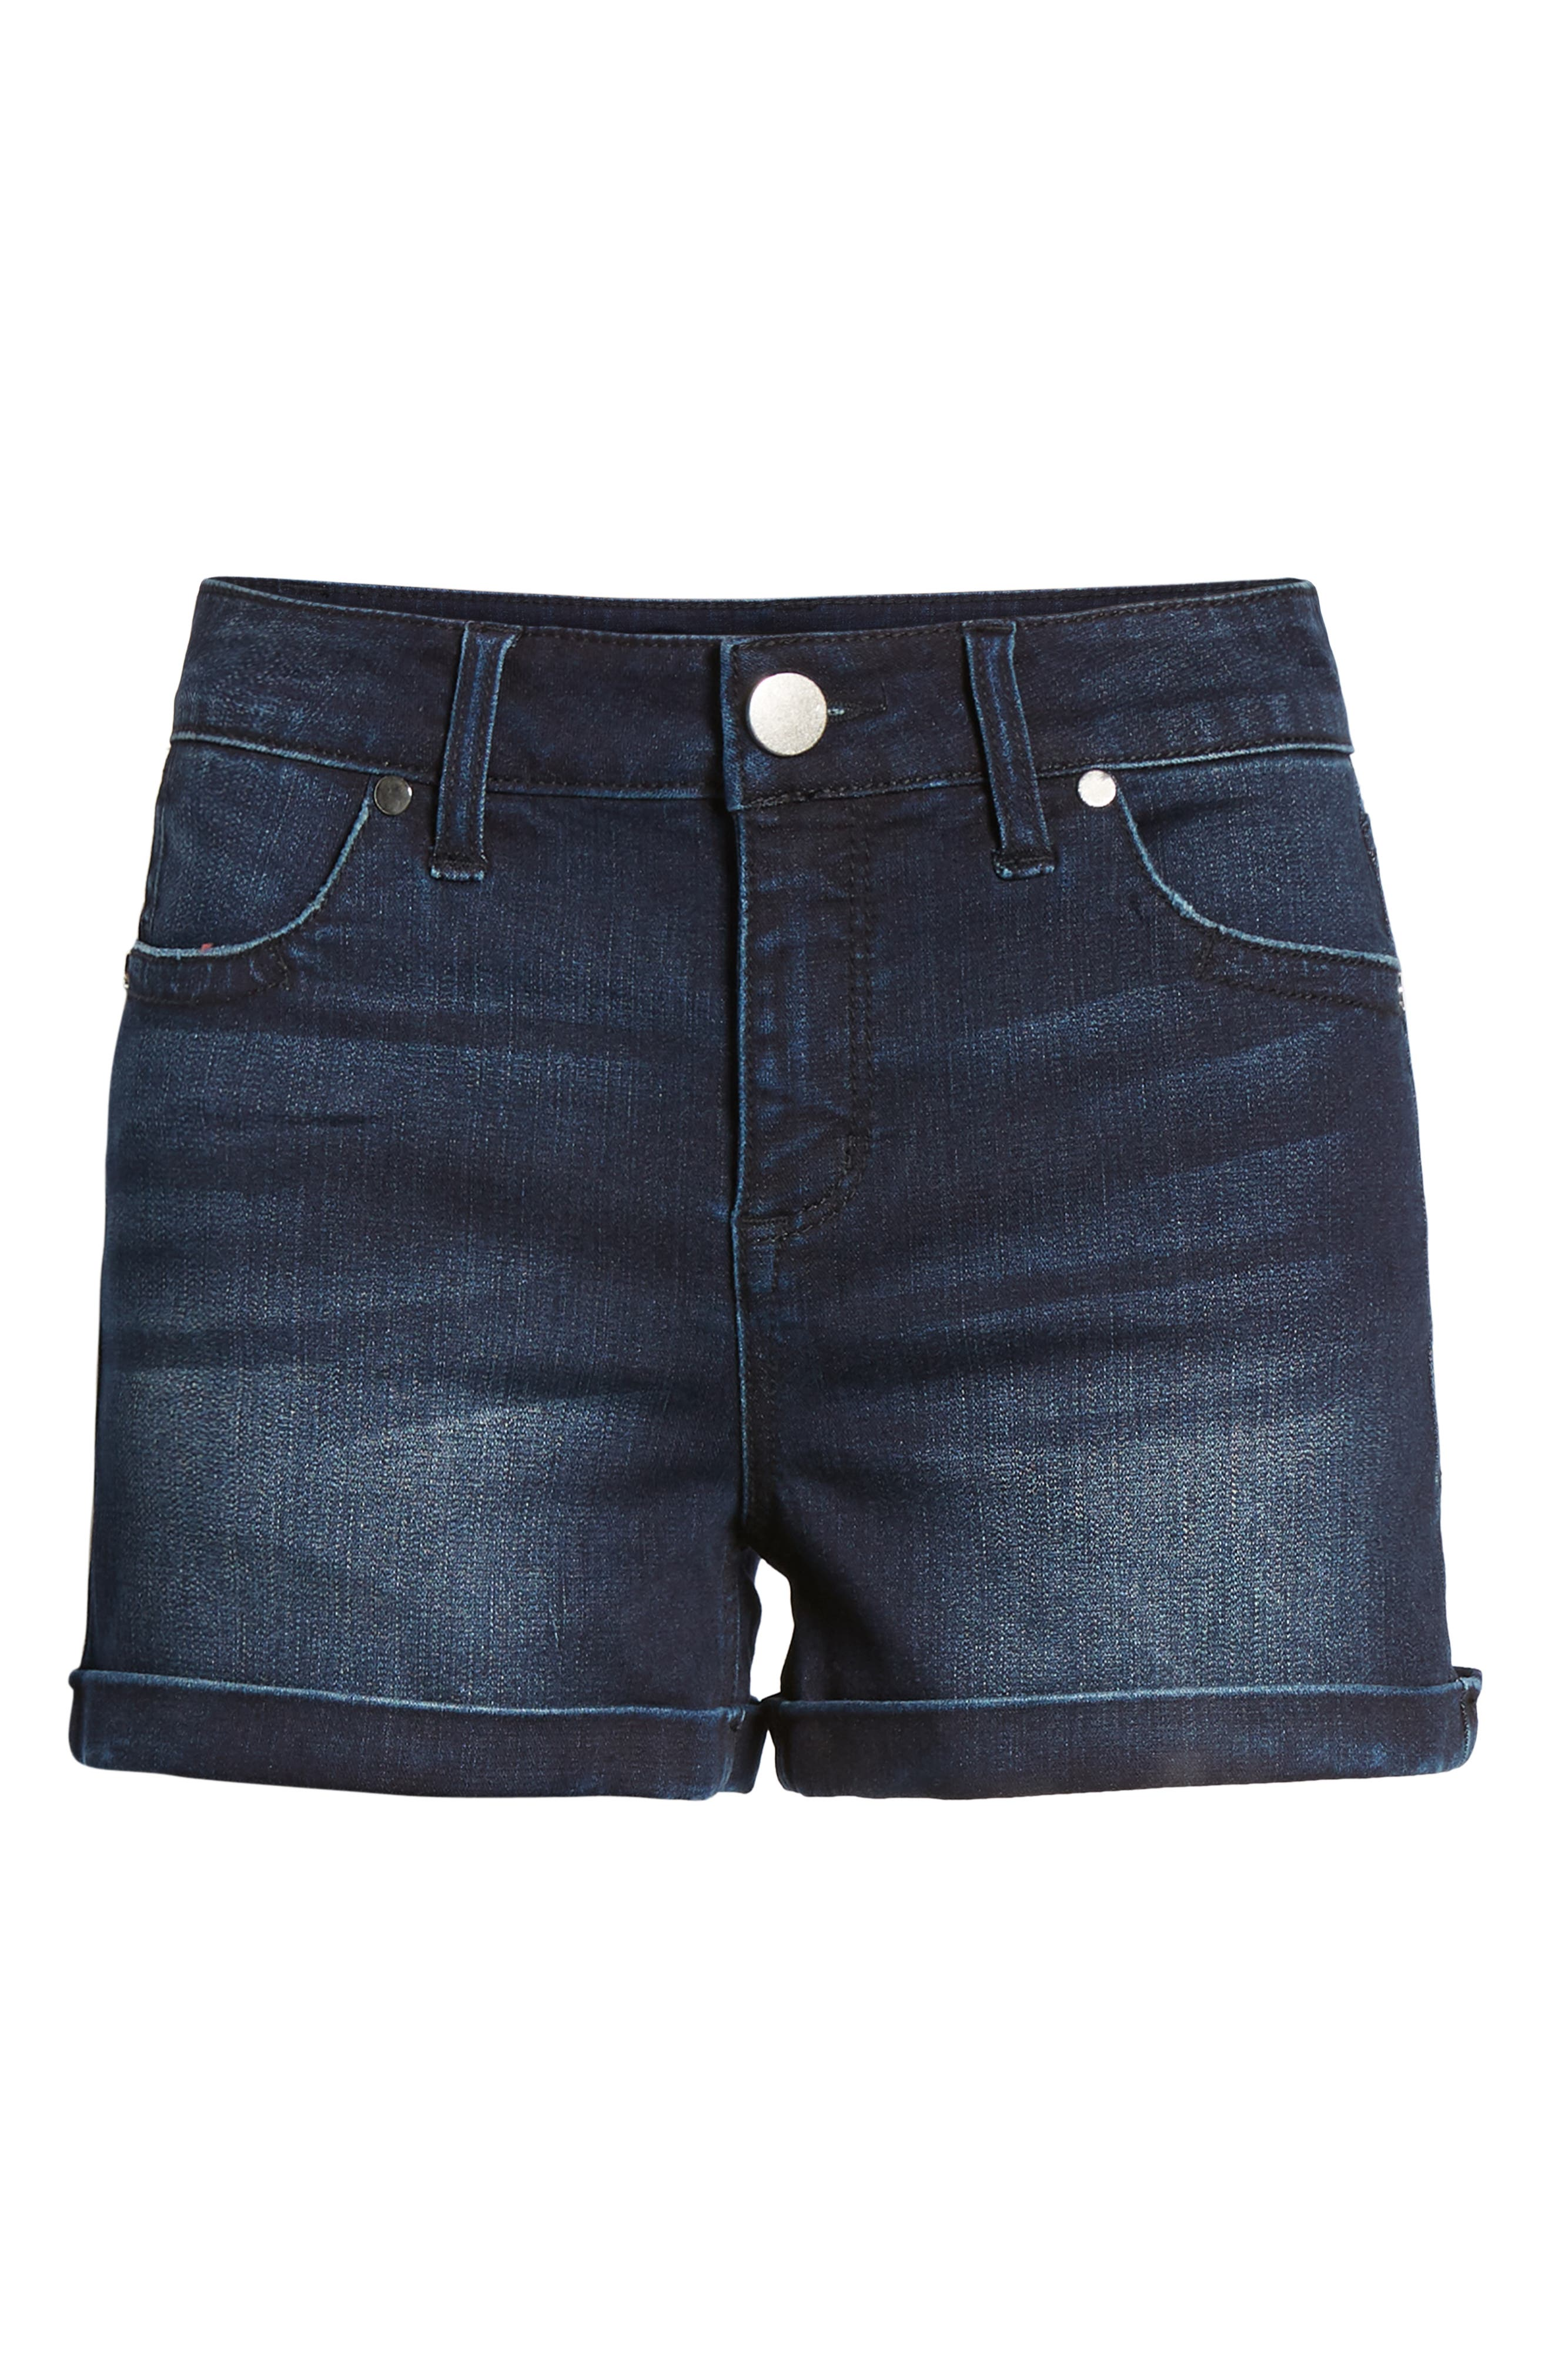 Cuffed Denim Shorts,                             Alternate thumbnail 7, color,                             404